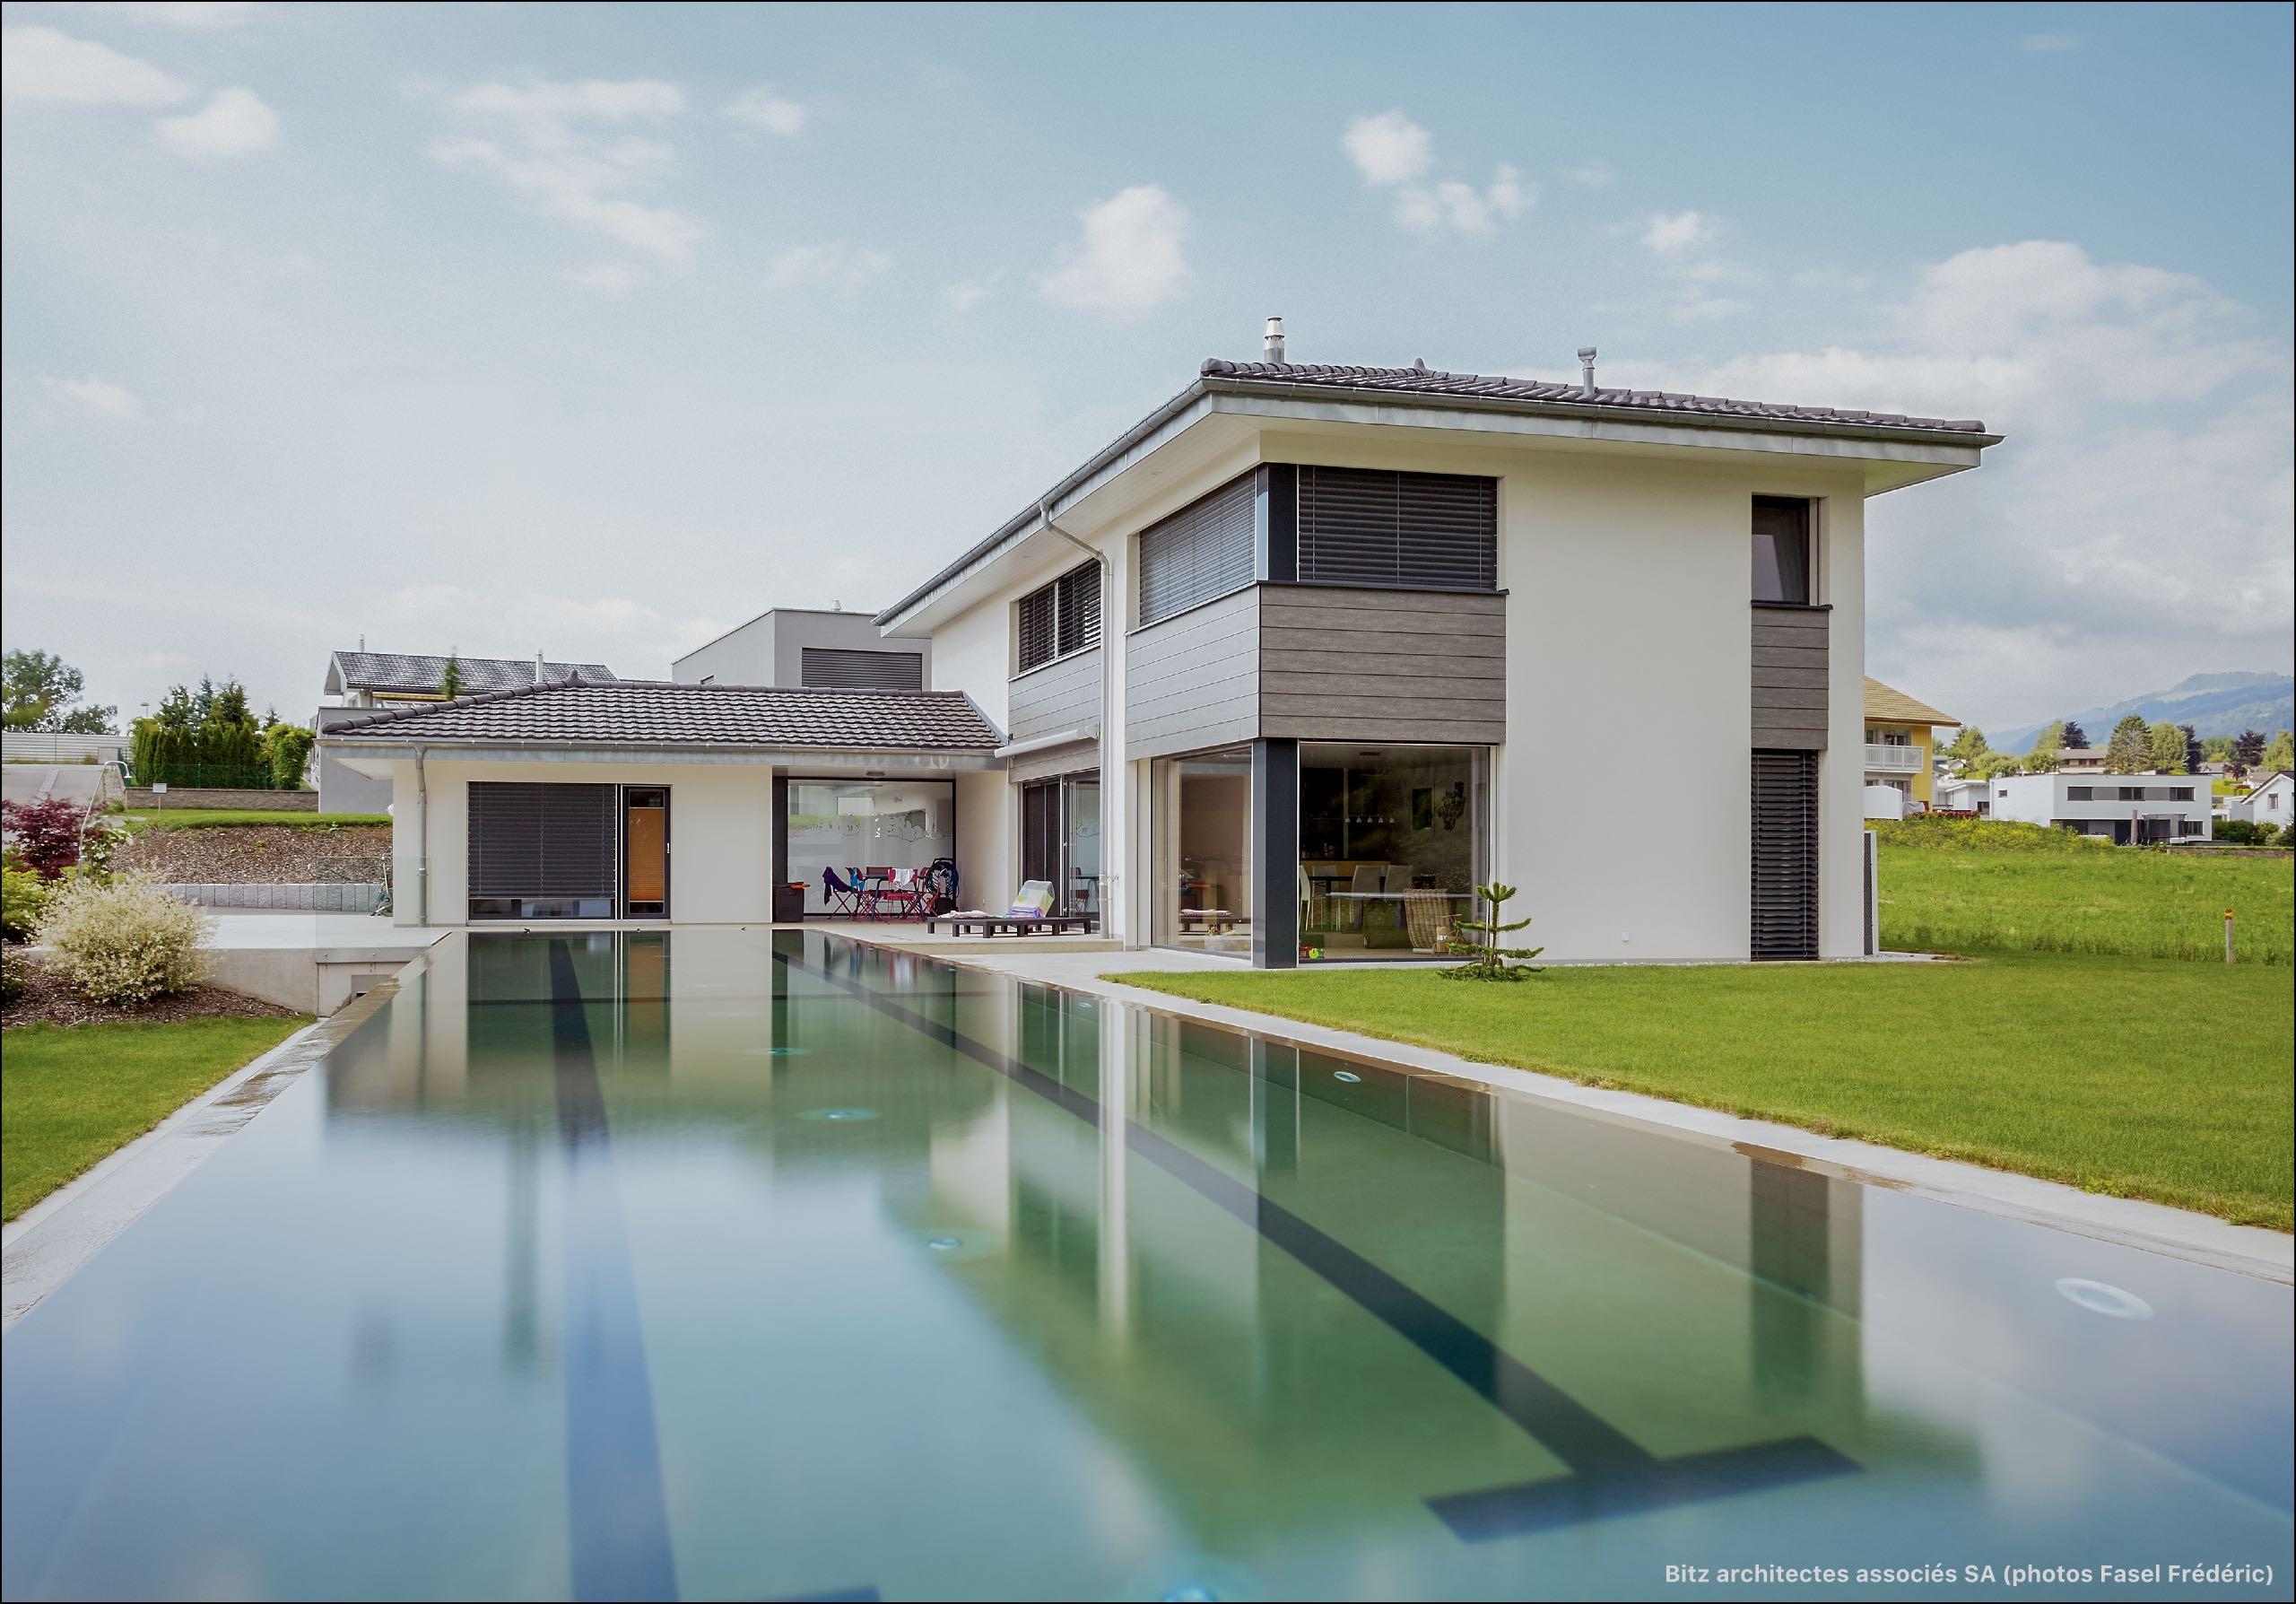 Zob bu habitation avec piscine de 25m bulle bitz for Construction piscine 25m